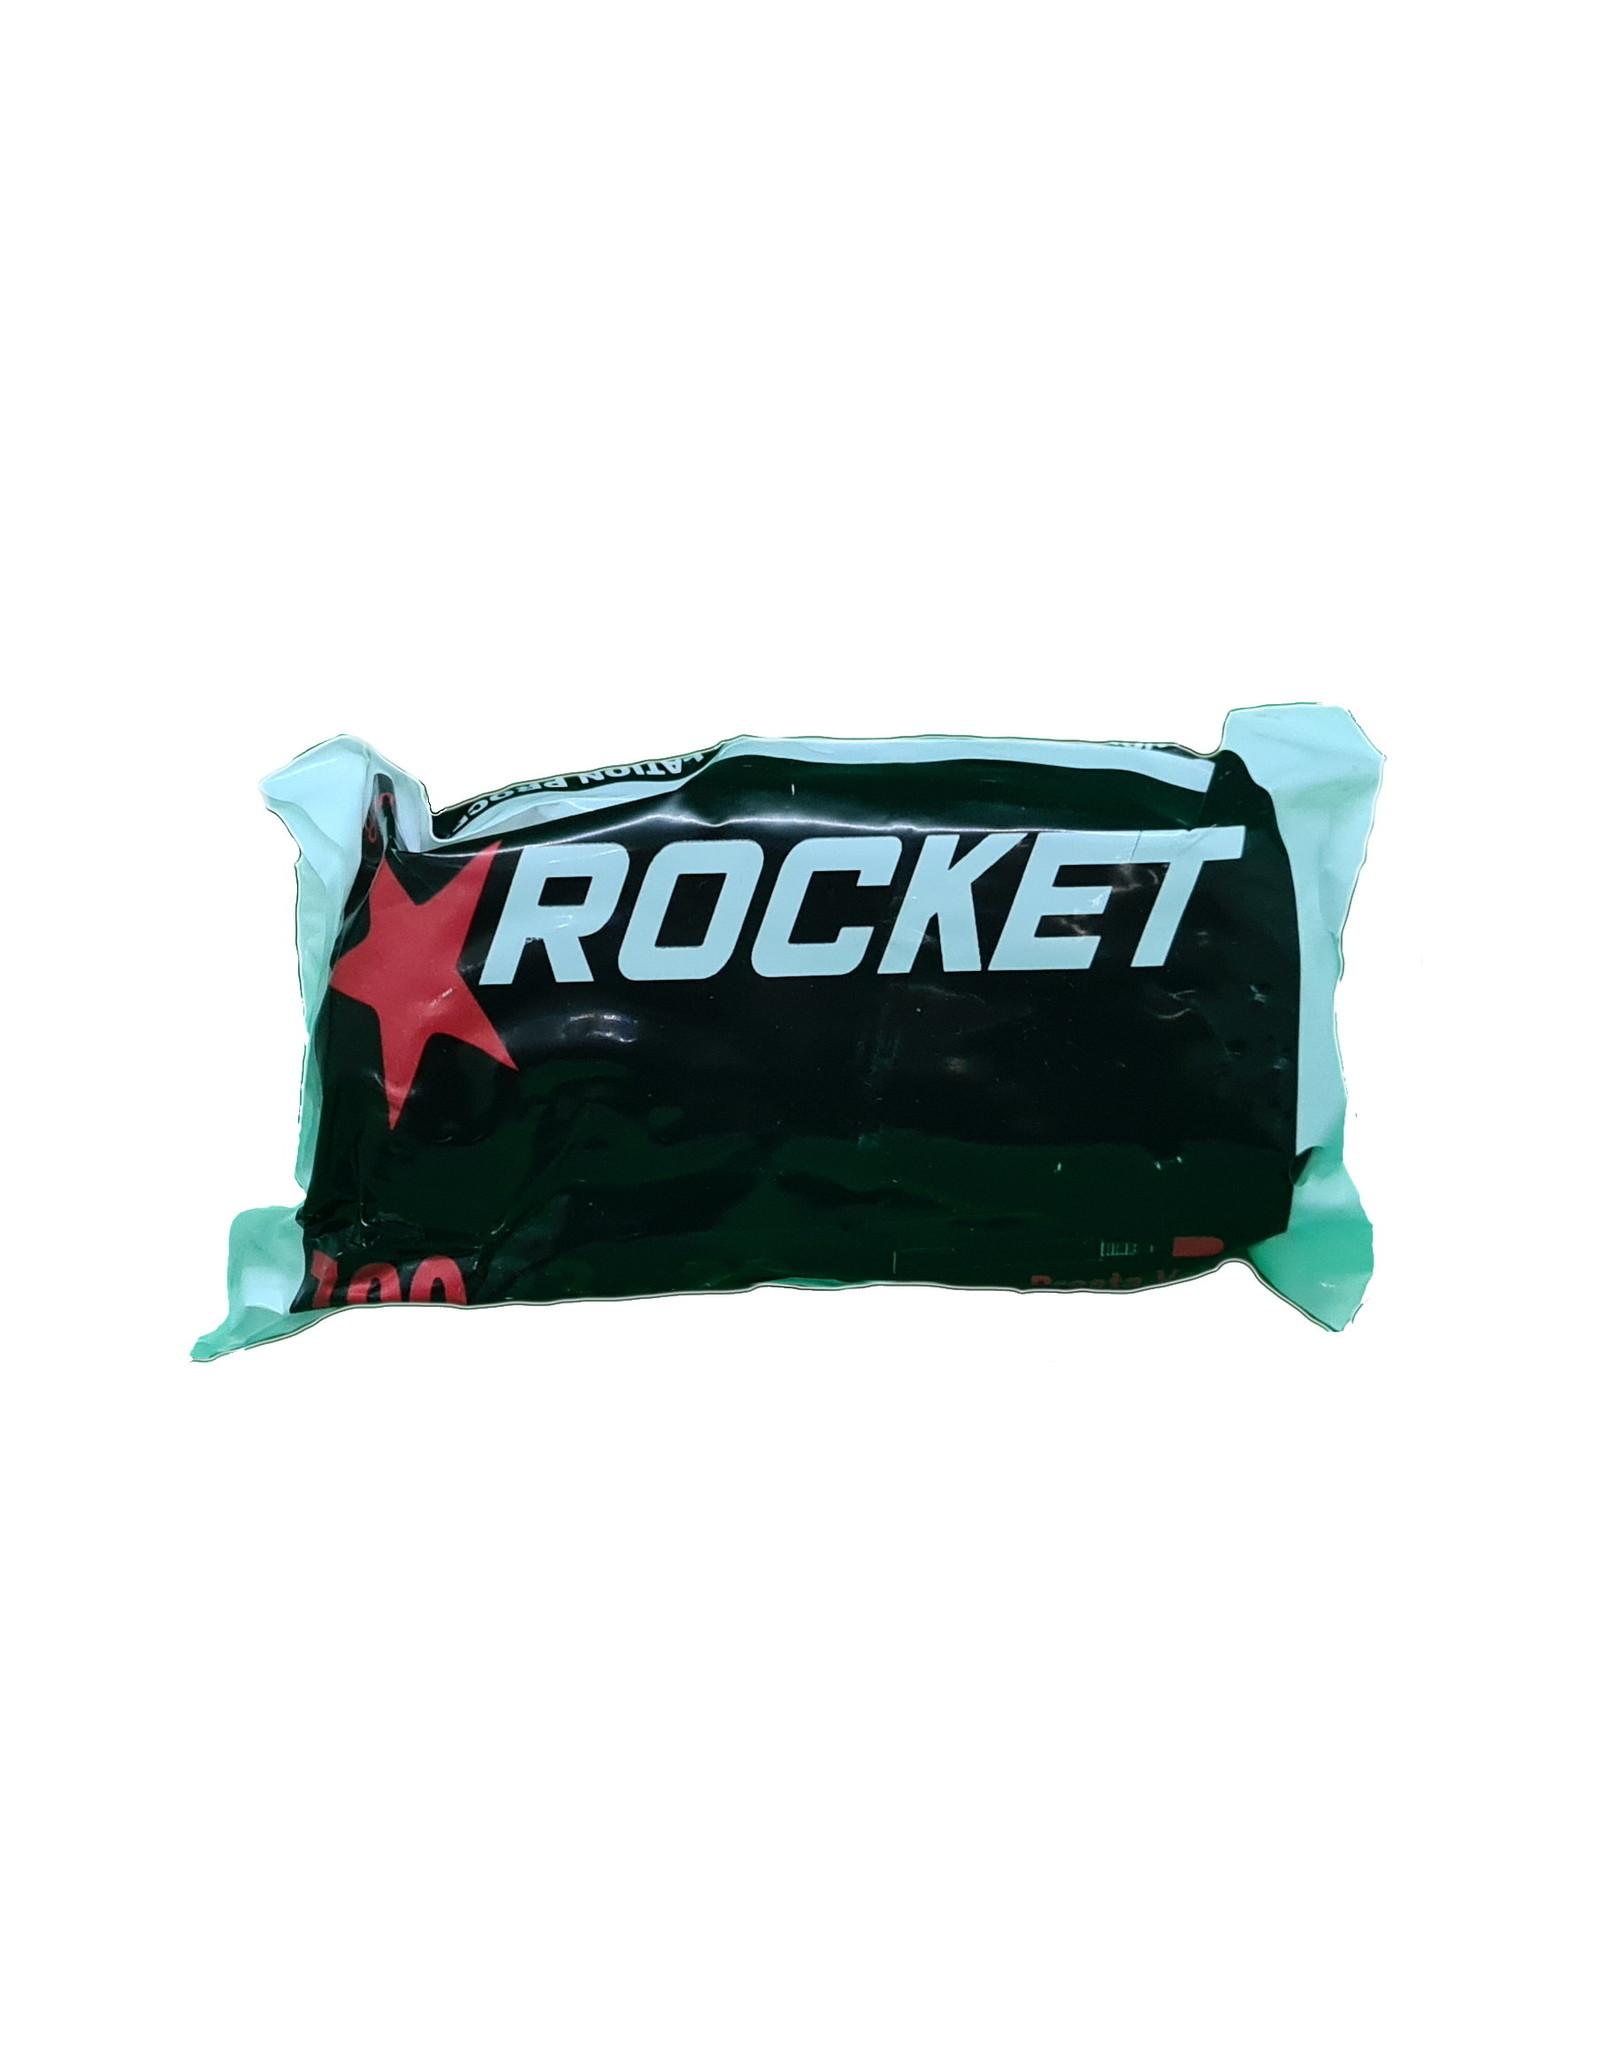 Rocket Tube 700 x  20/25 Presta Valve 60mm